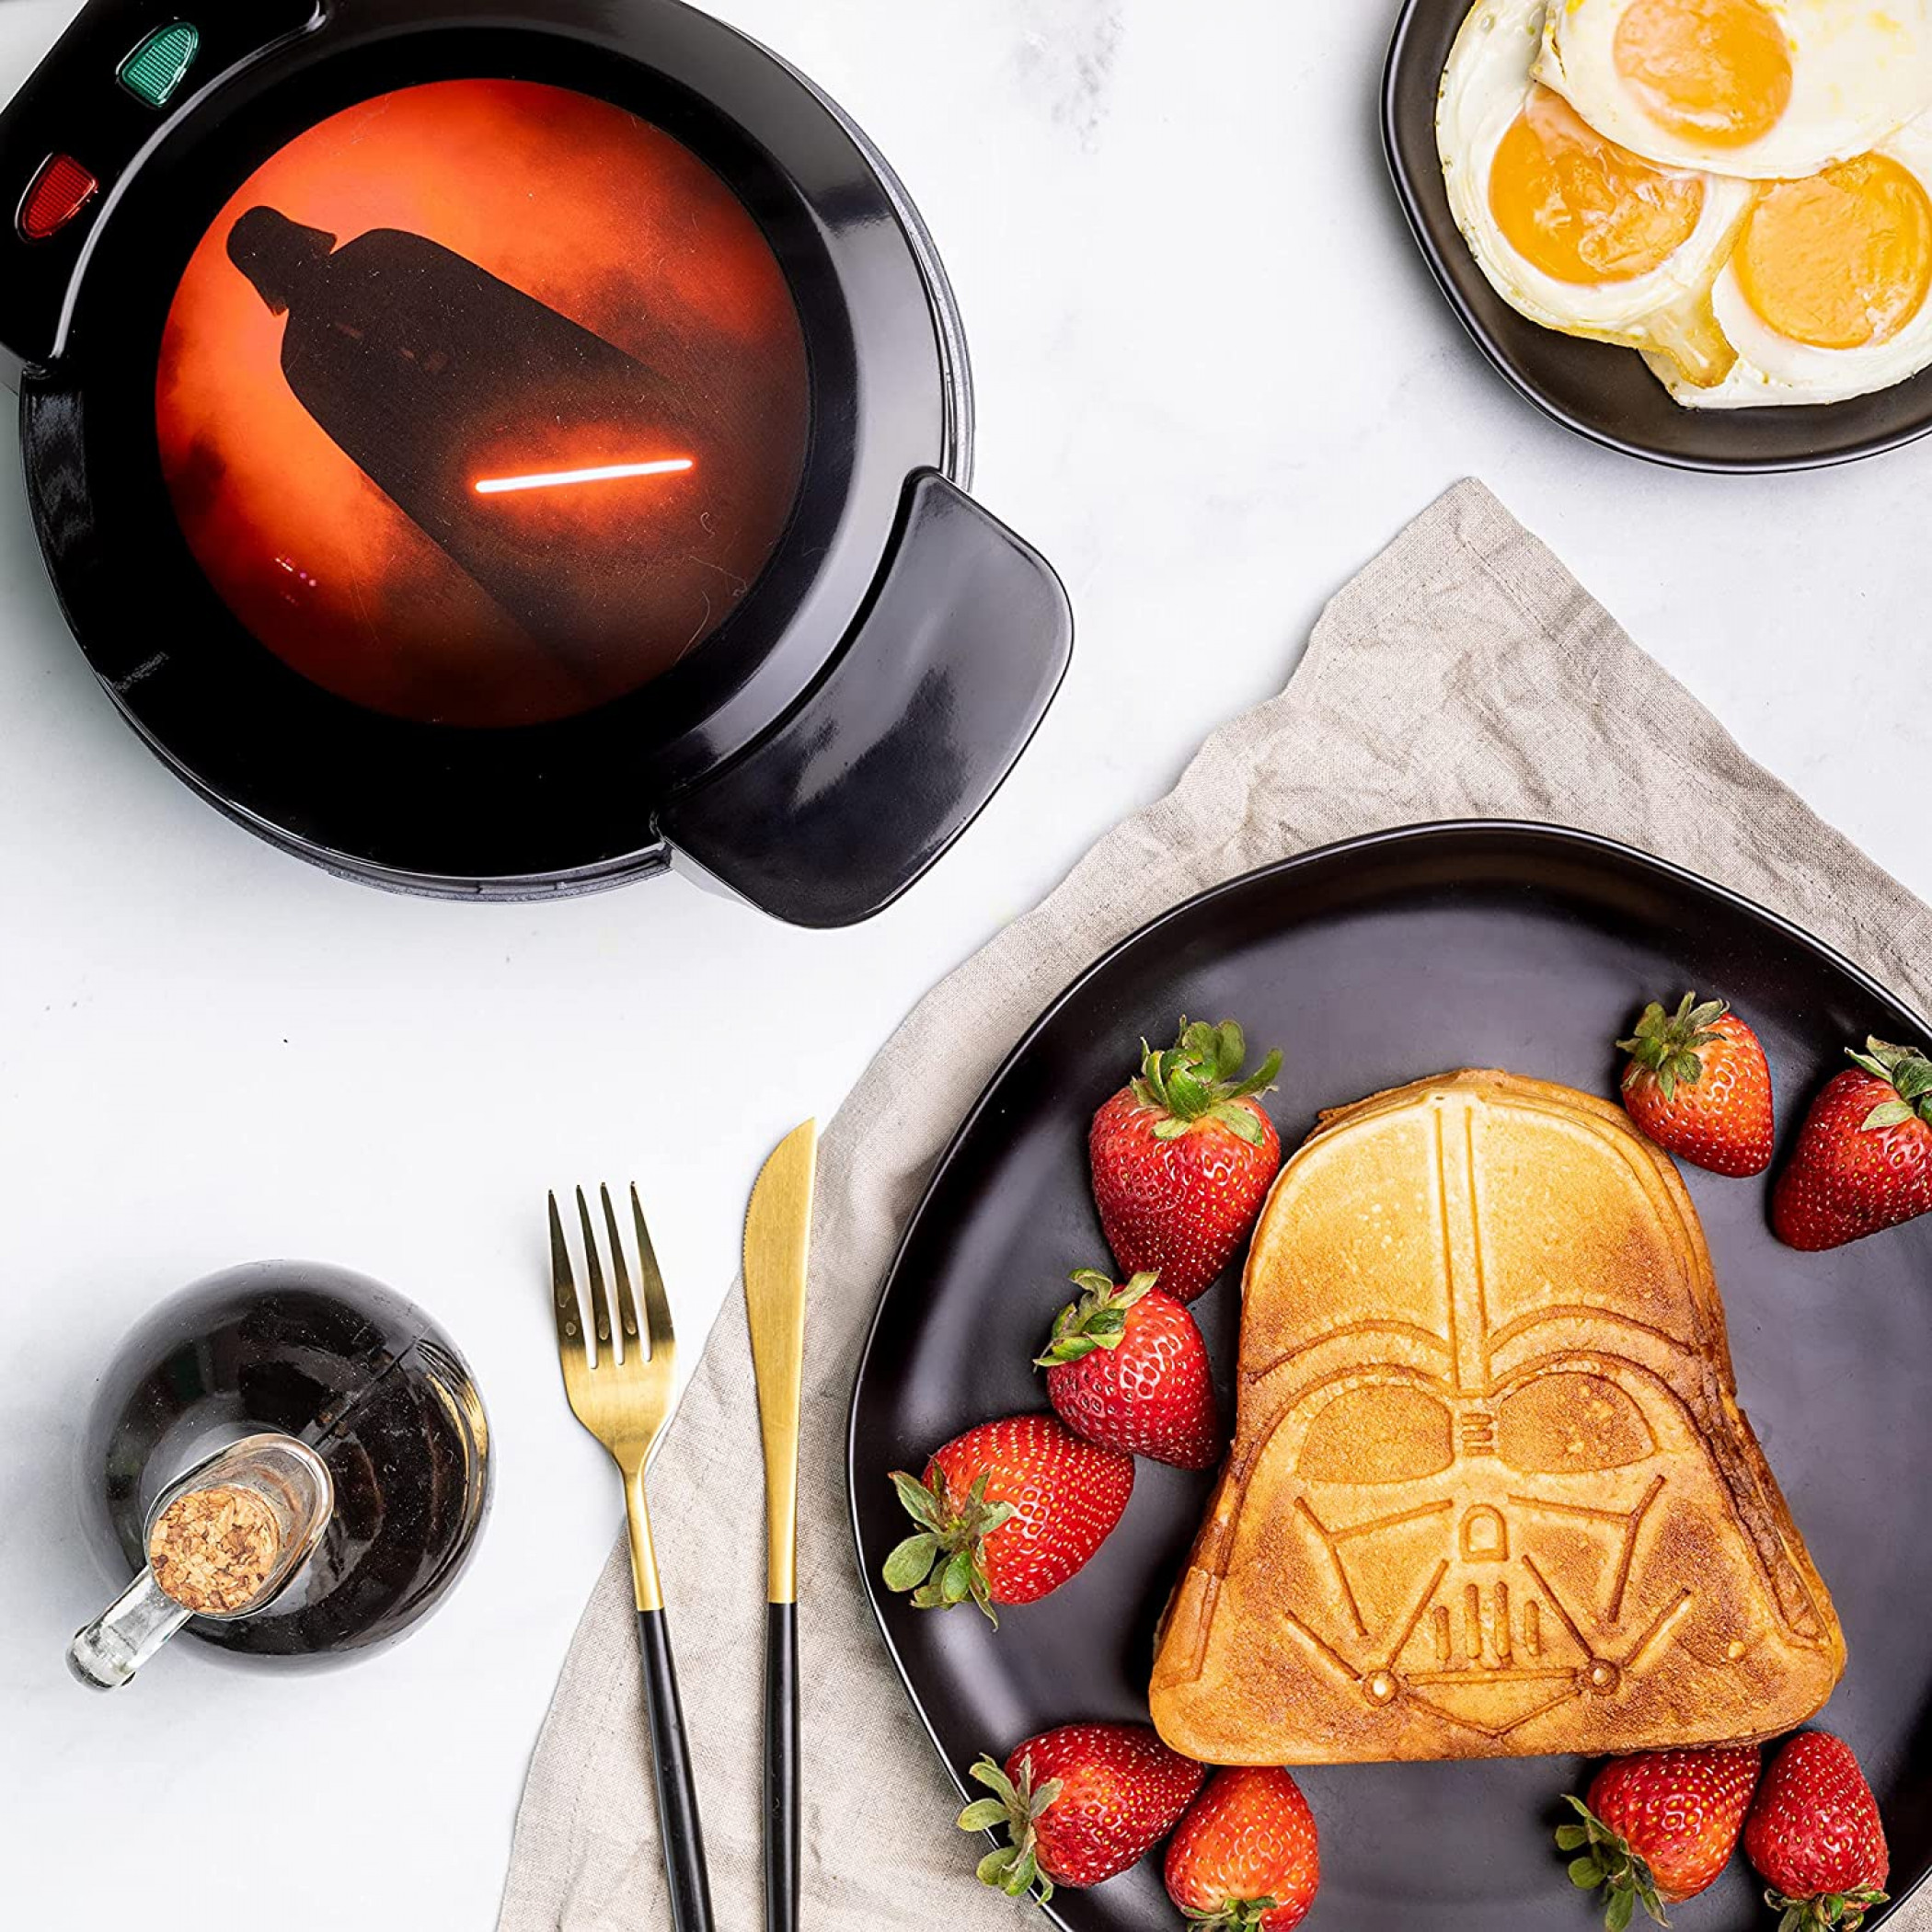 Star Wars Darth Vader with Lightsaber Waffle Maker from Uncanny Brands